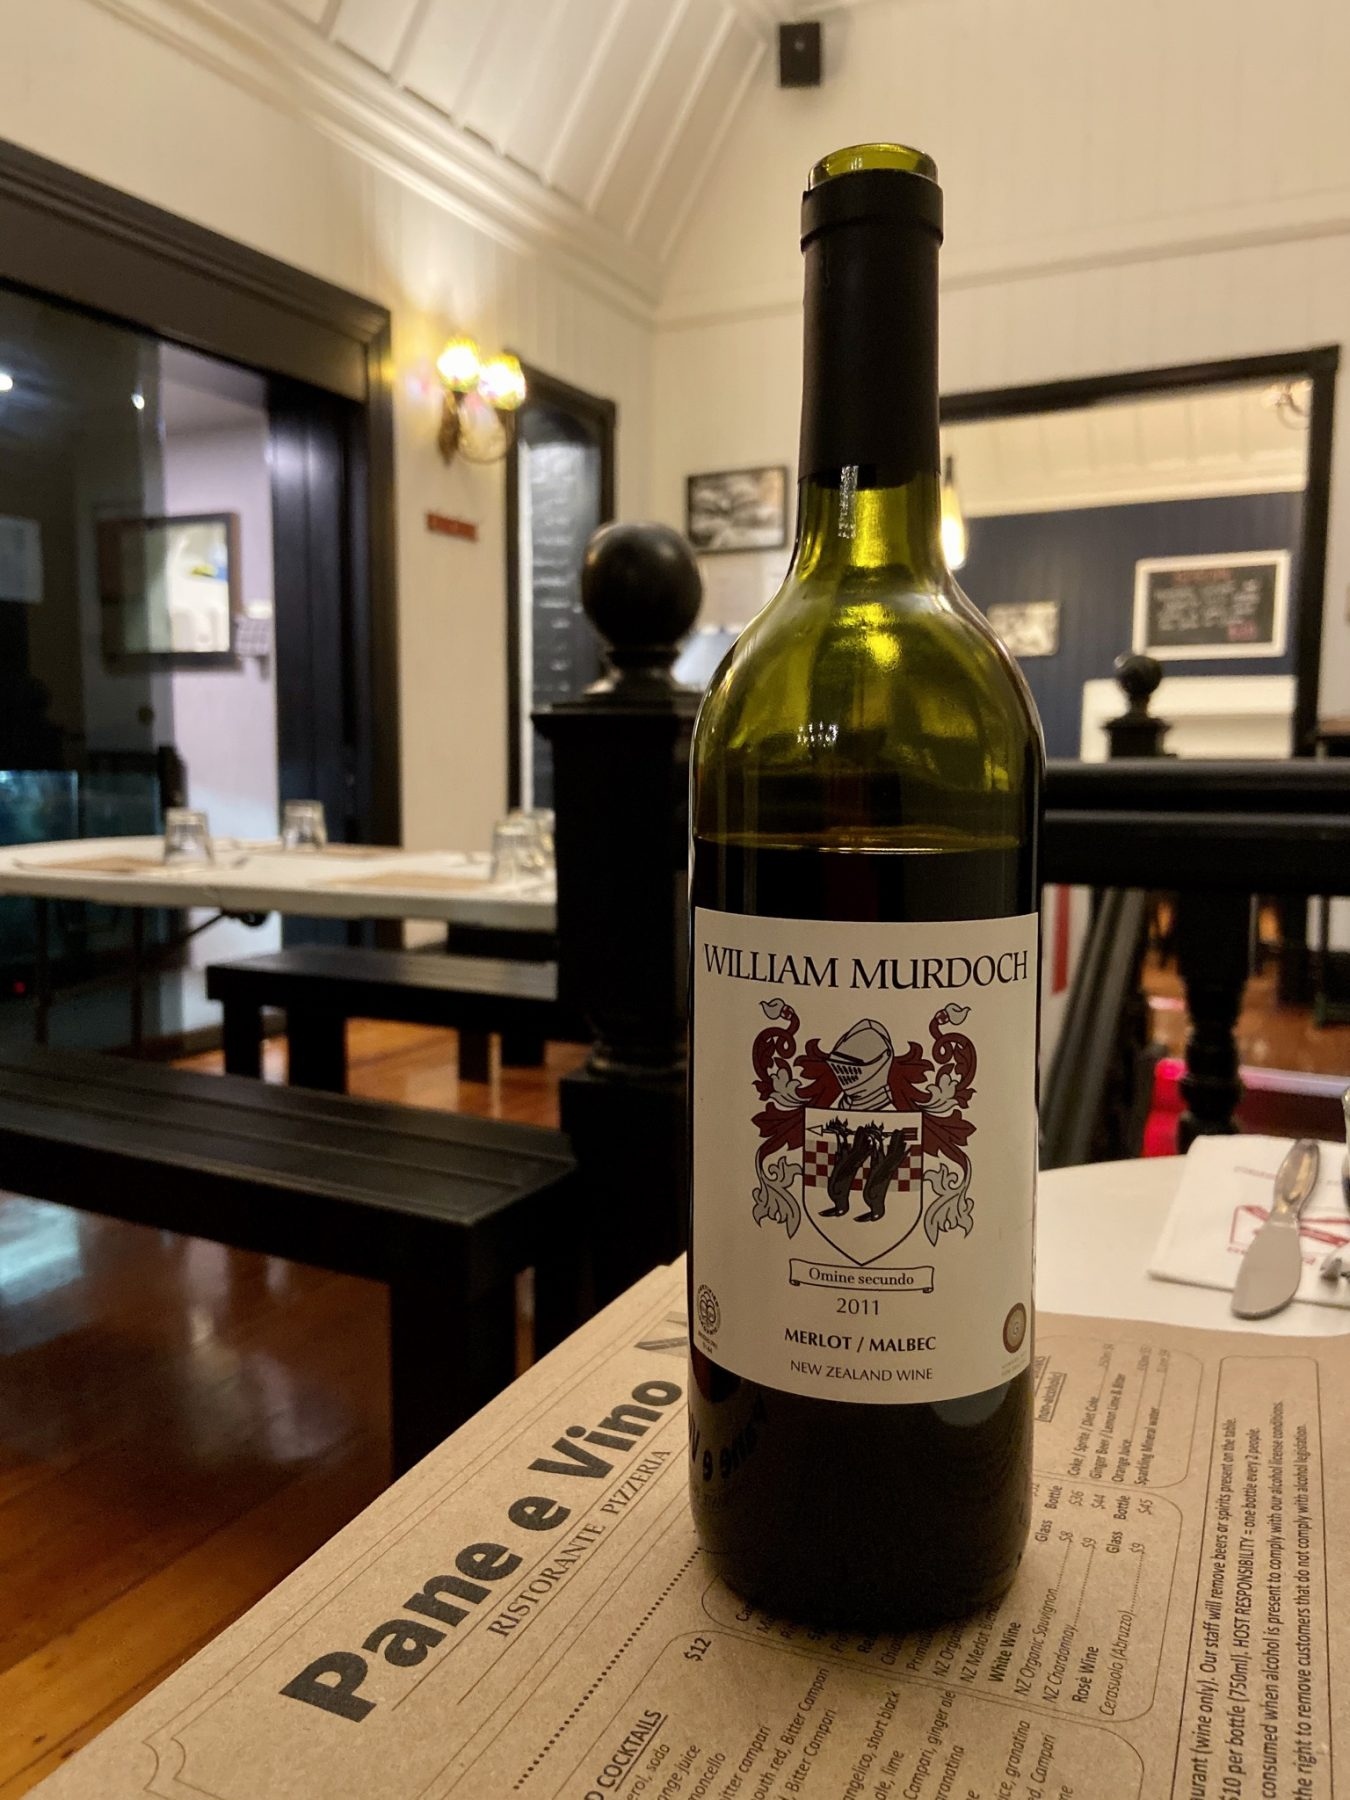 William Murdoch Wine at Pane E Vino Italian Restaurant Ponsonby